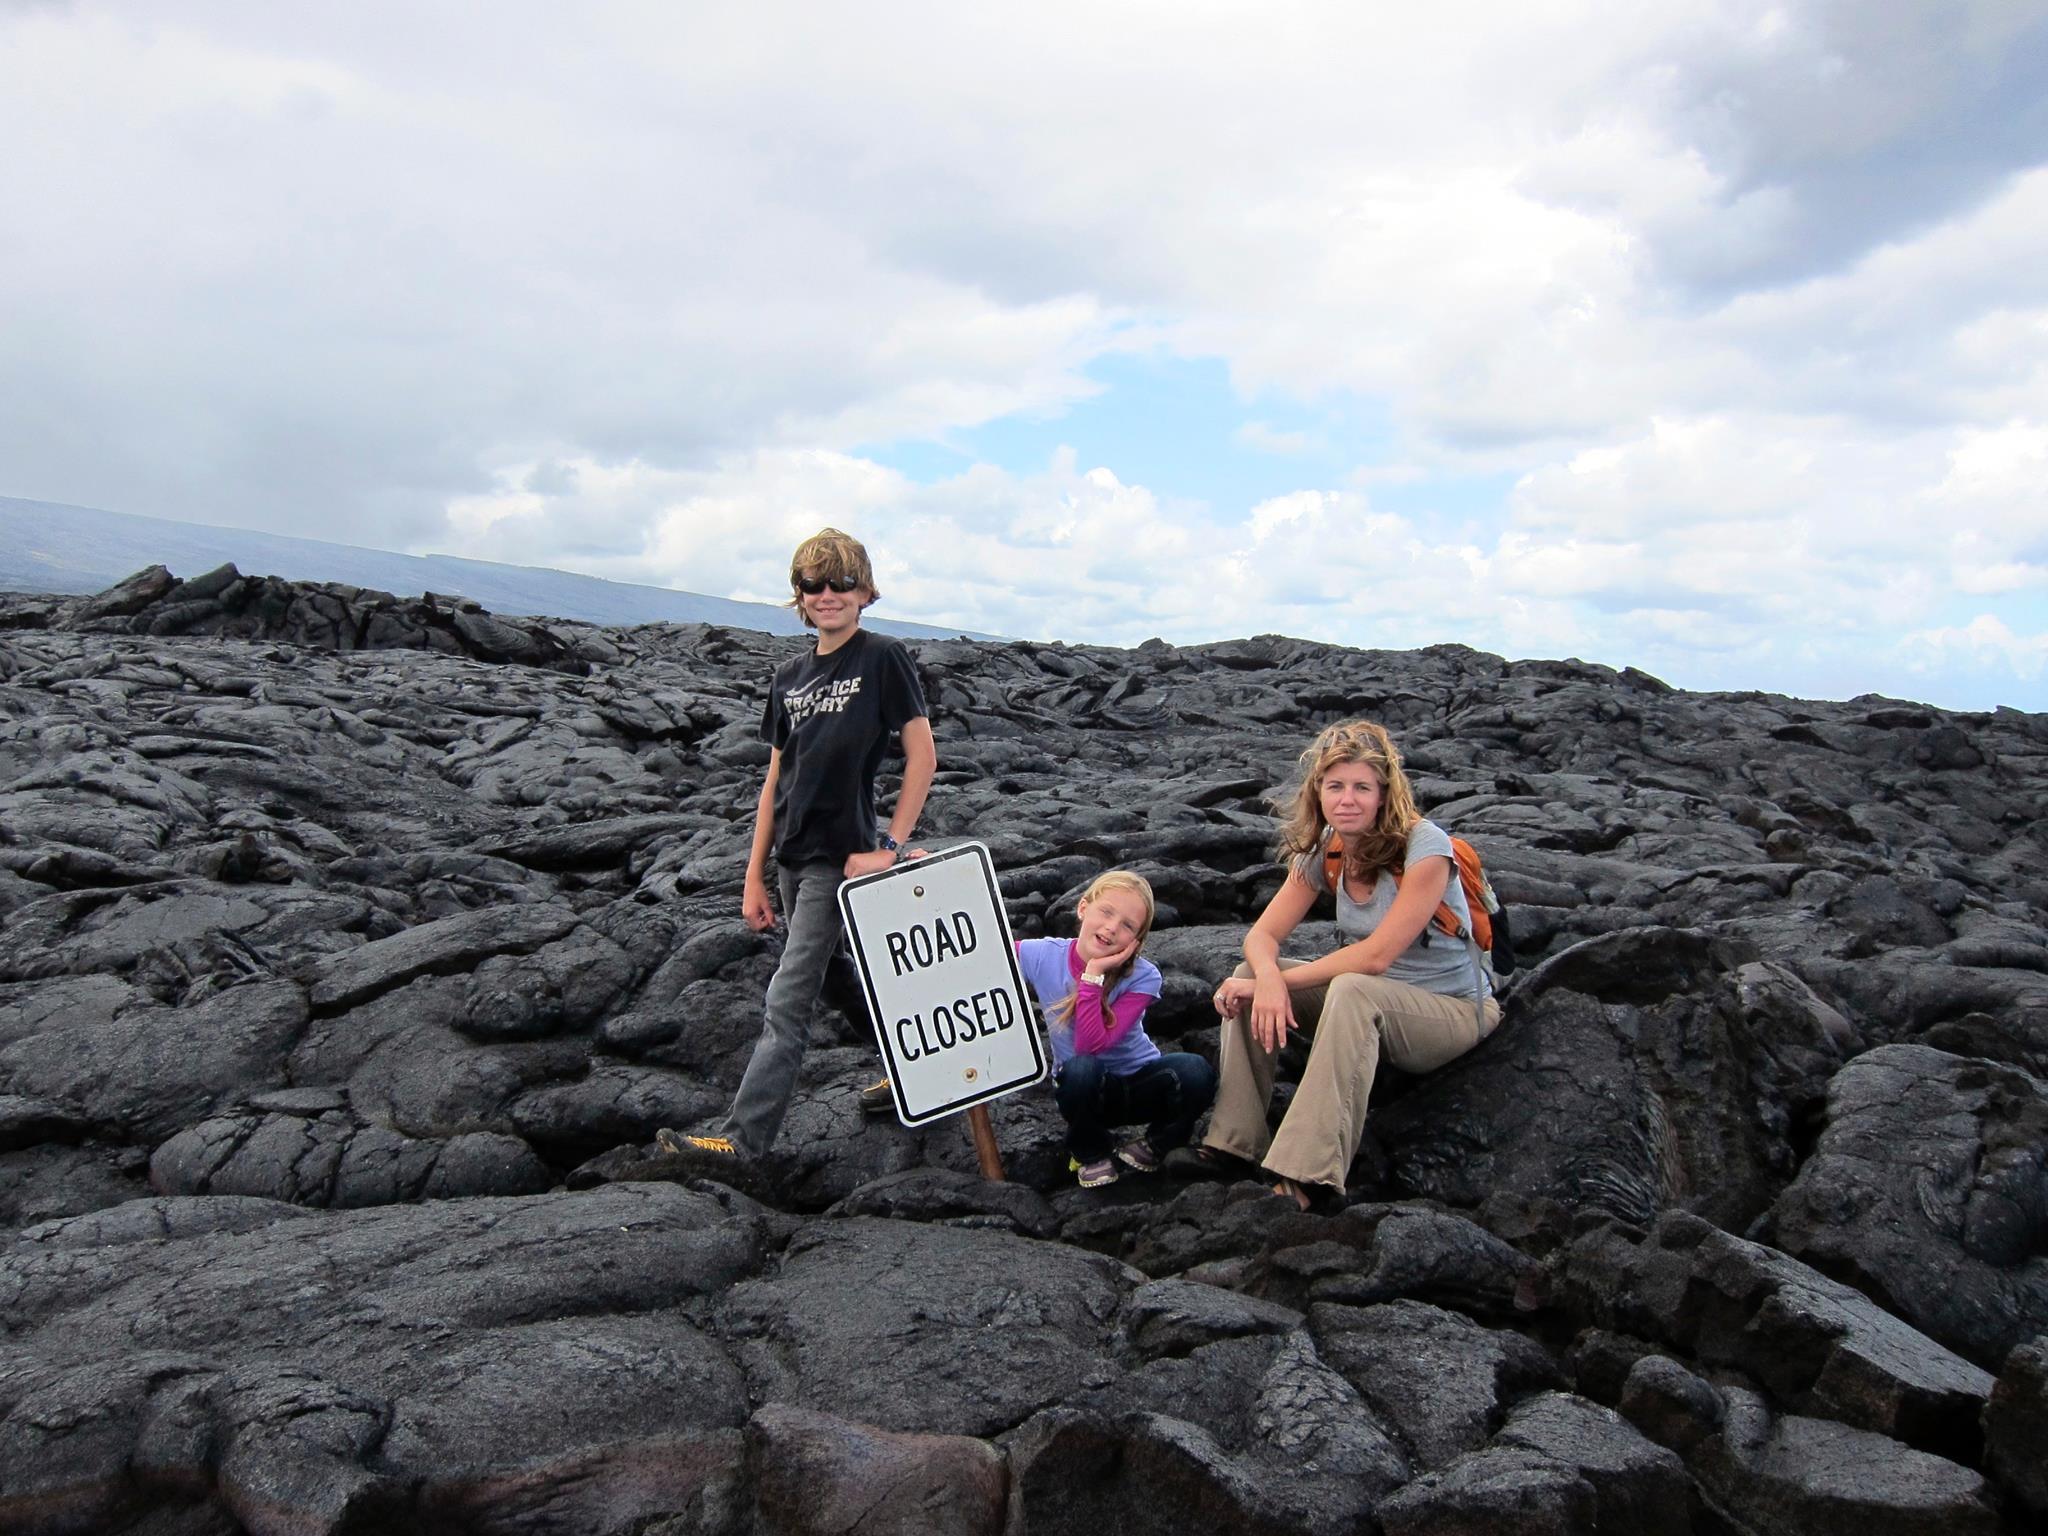 Alison & Kids - Volcanoes National Park